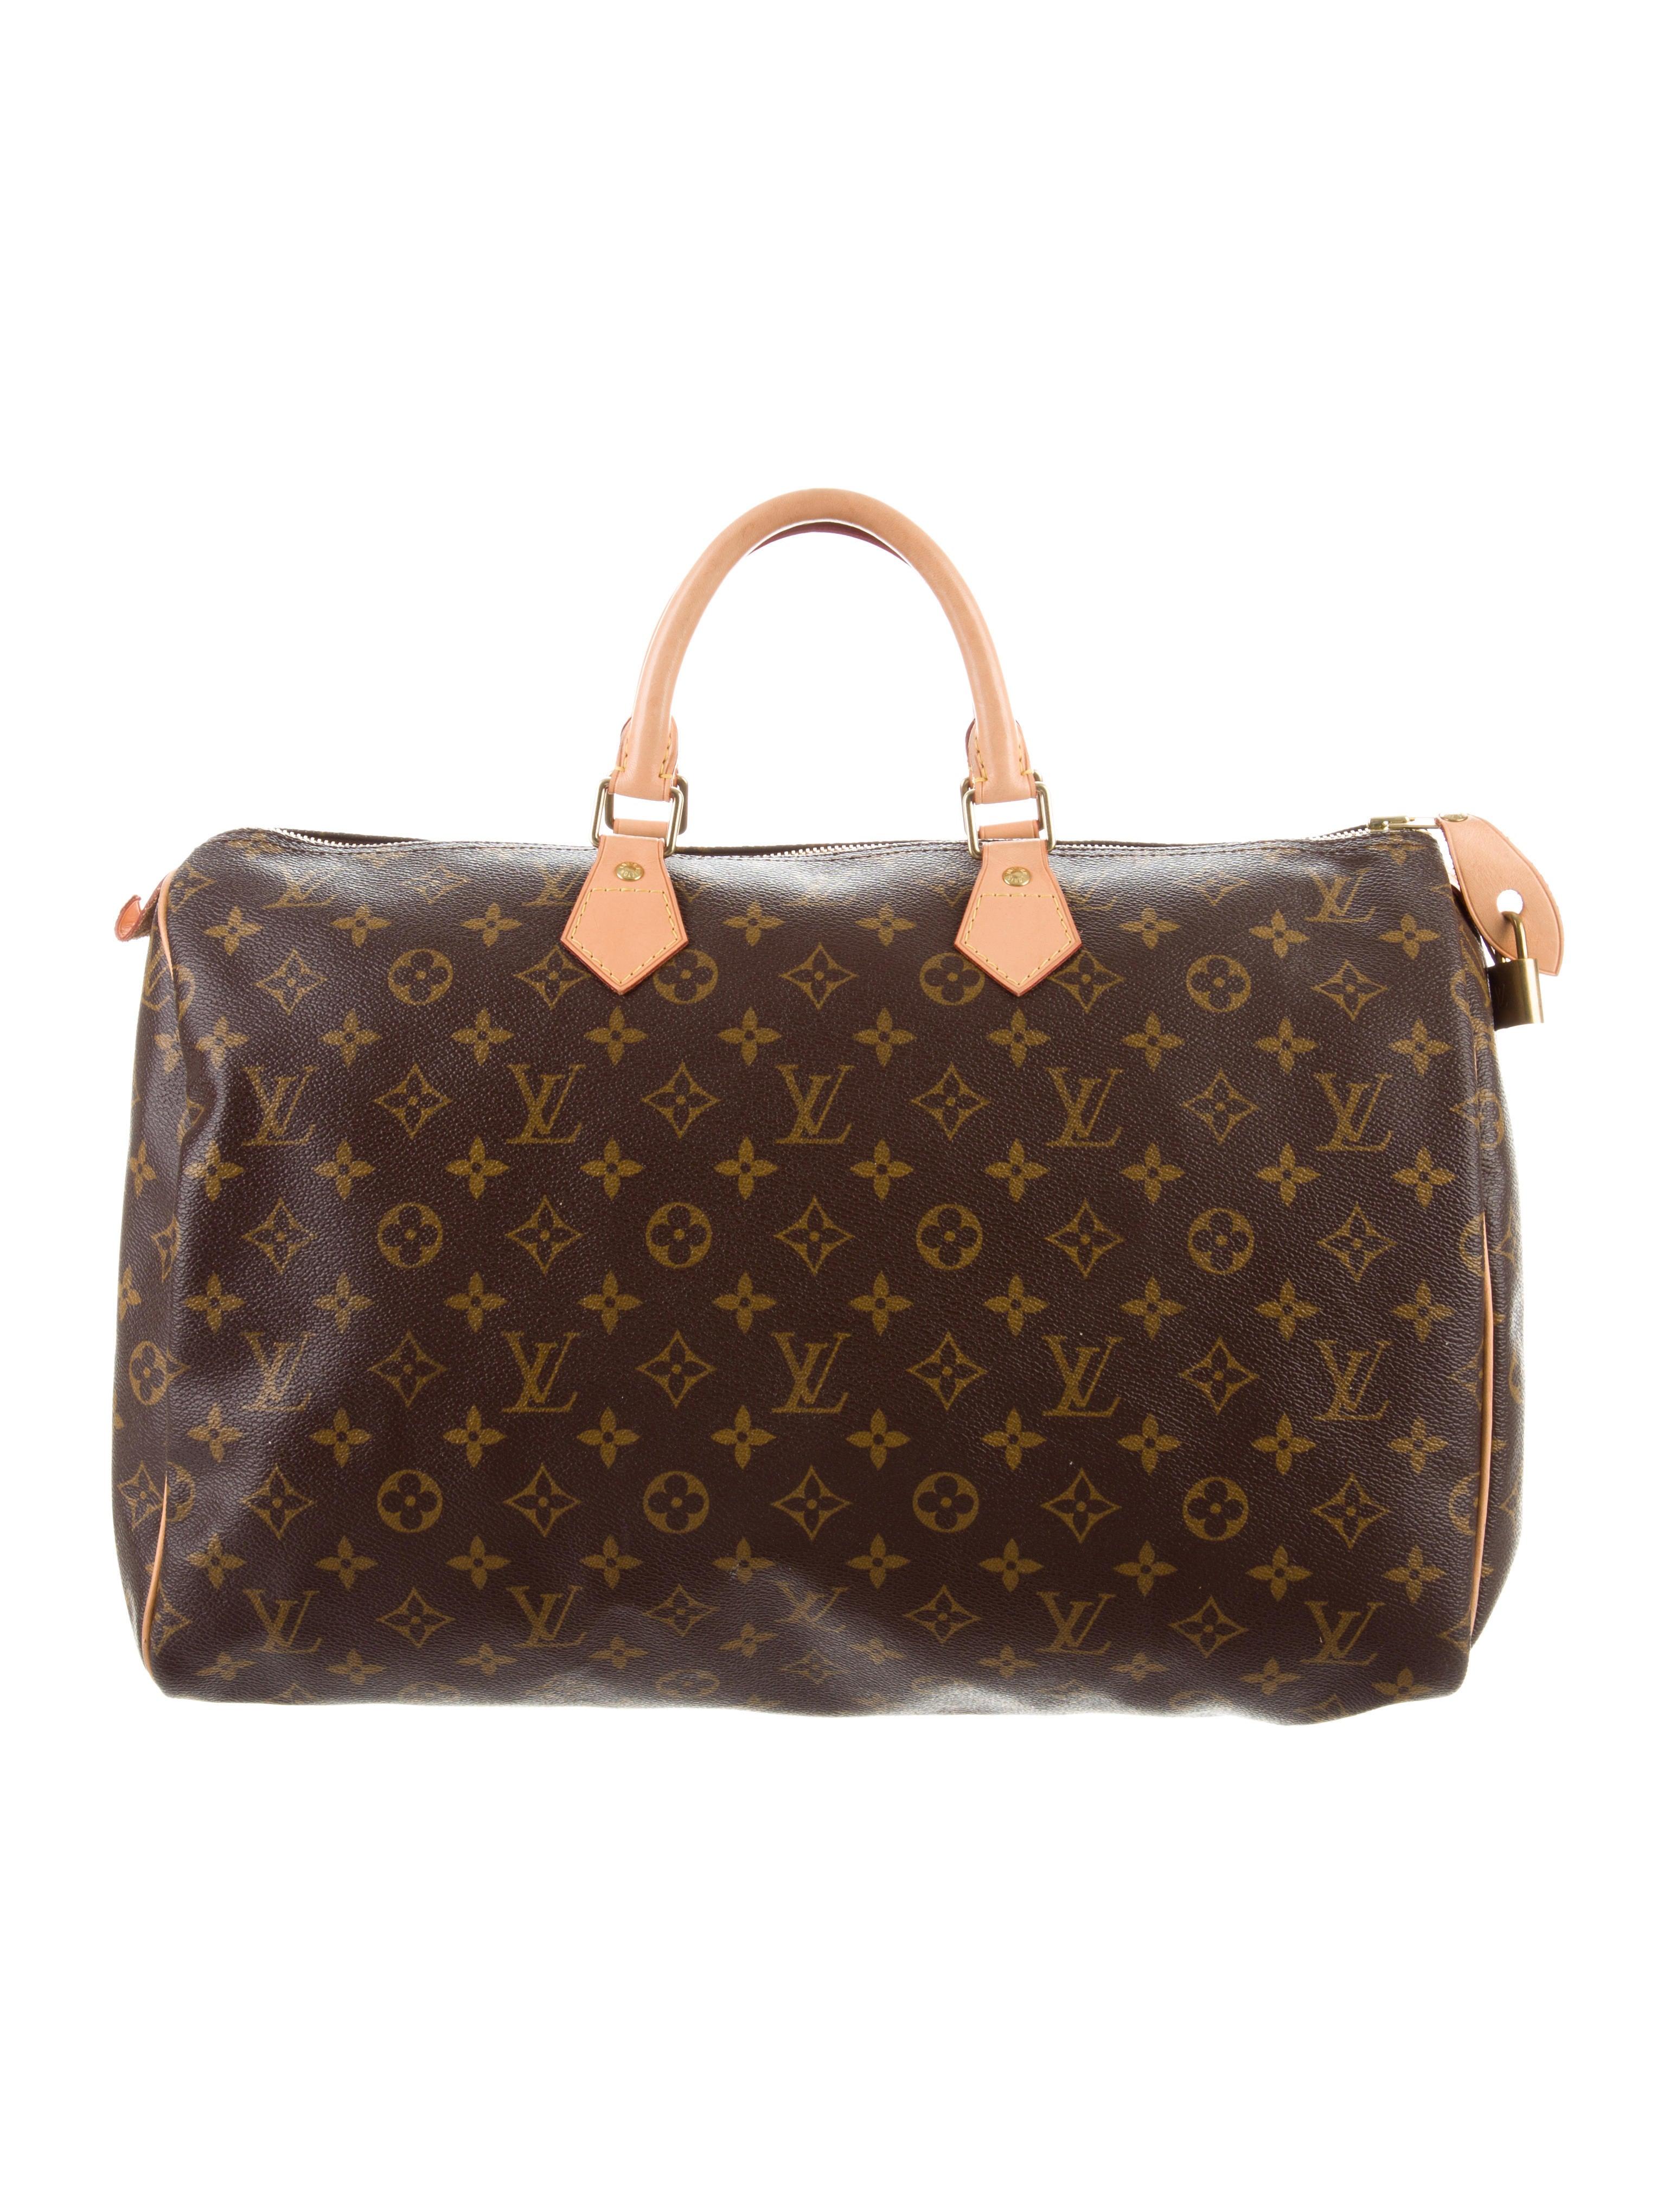 dc0957b00b05 Louis Vuitton Monogram Speedy 40 - Handbags - LOU184332